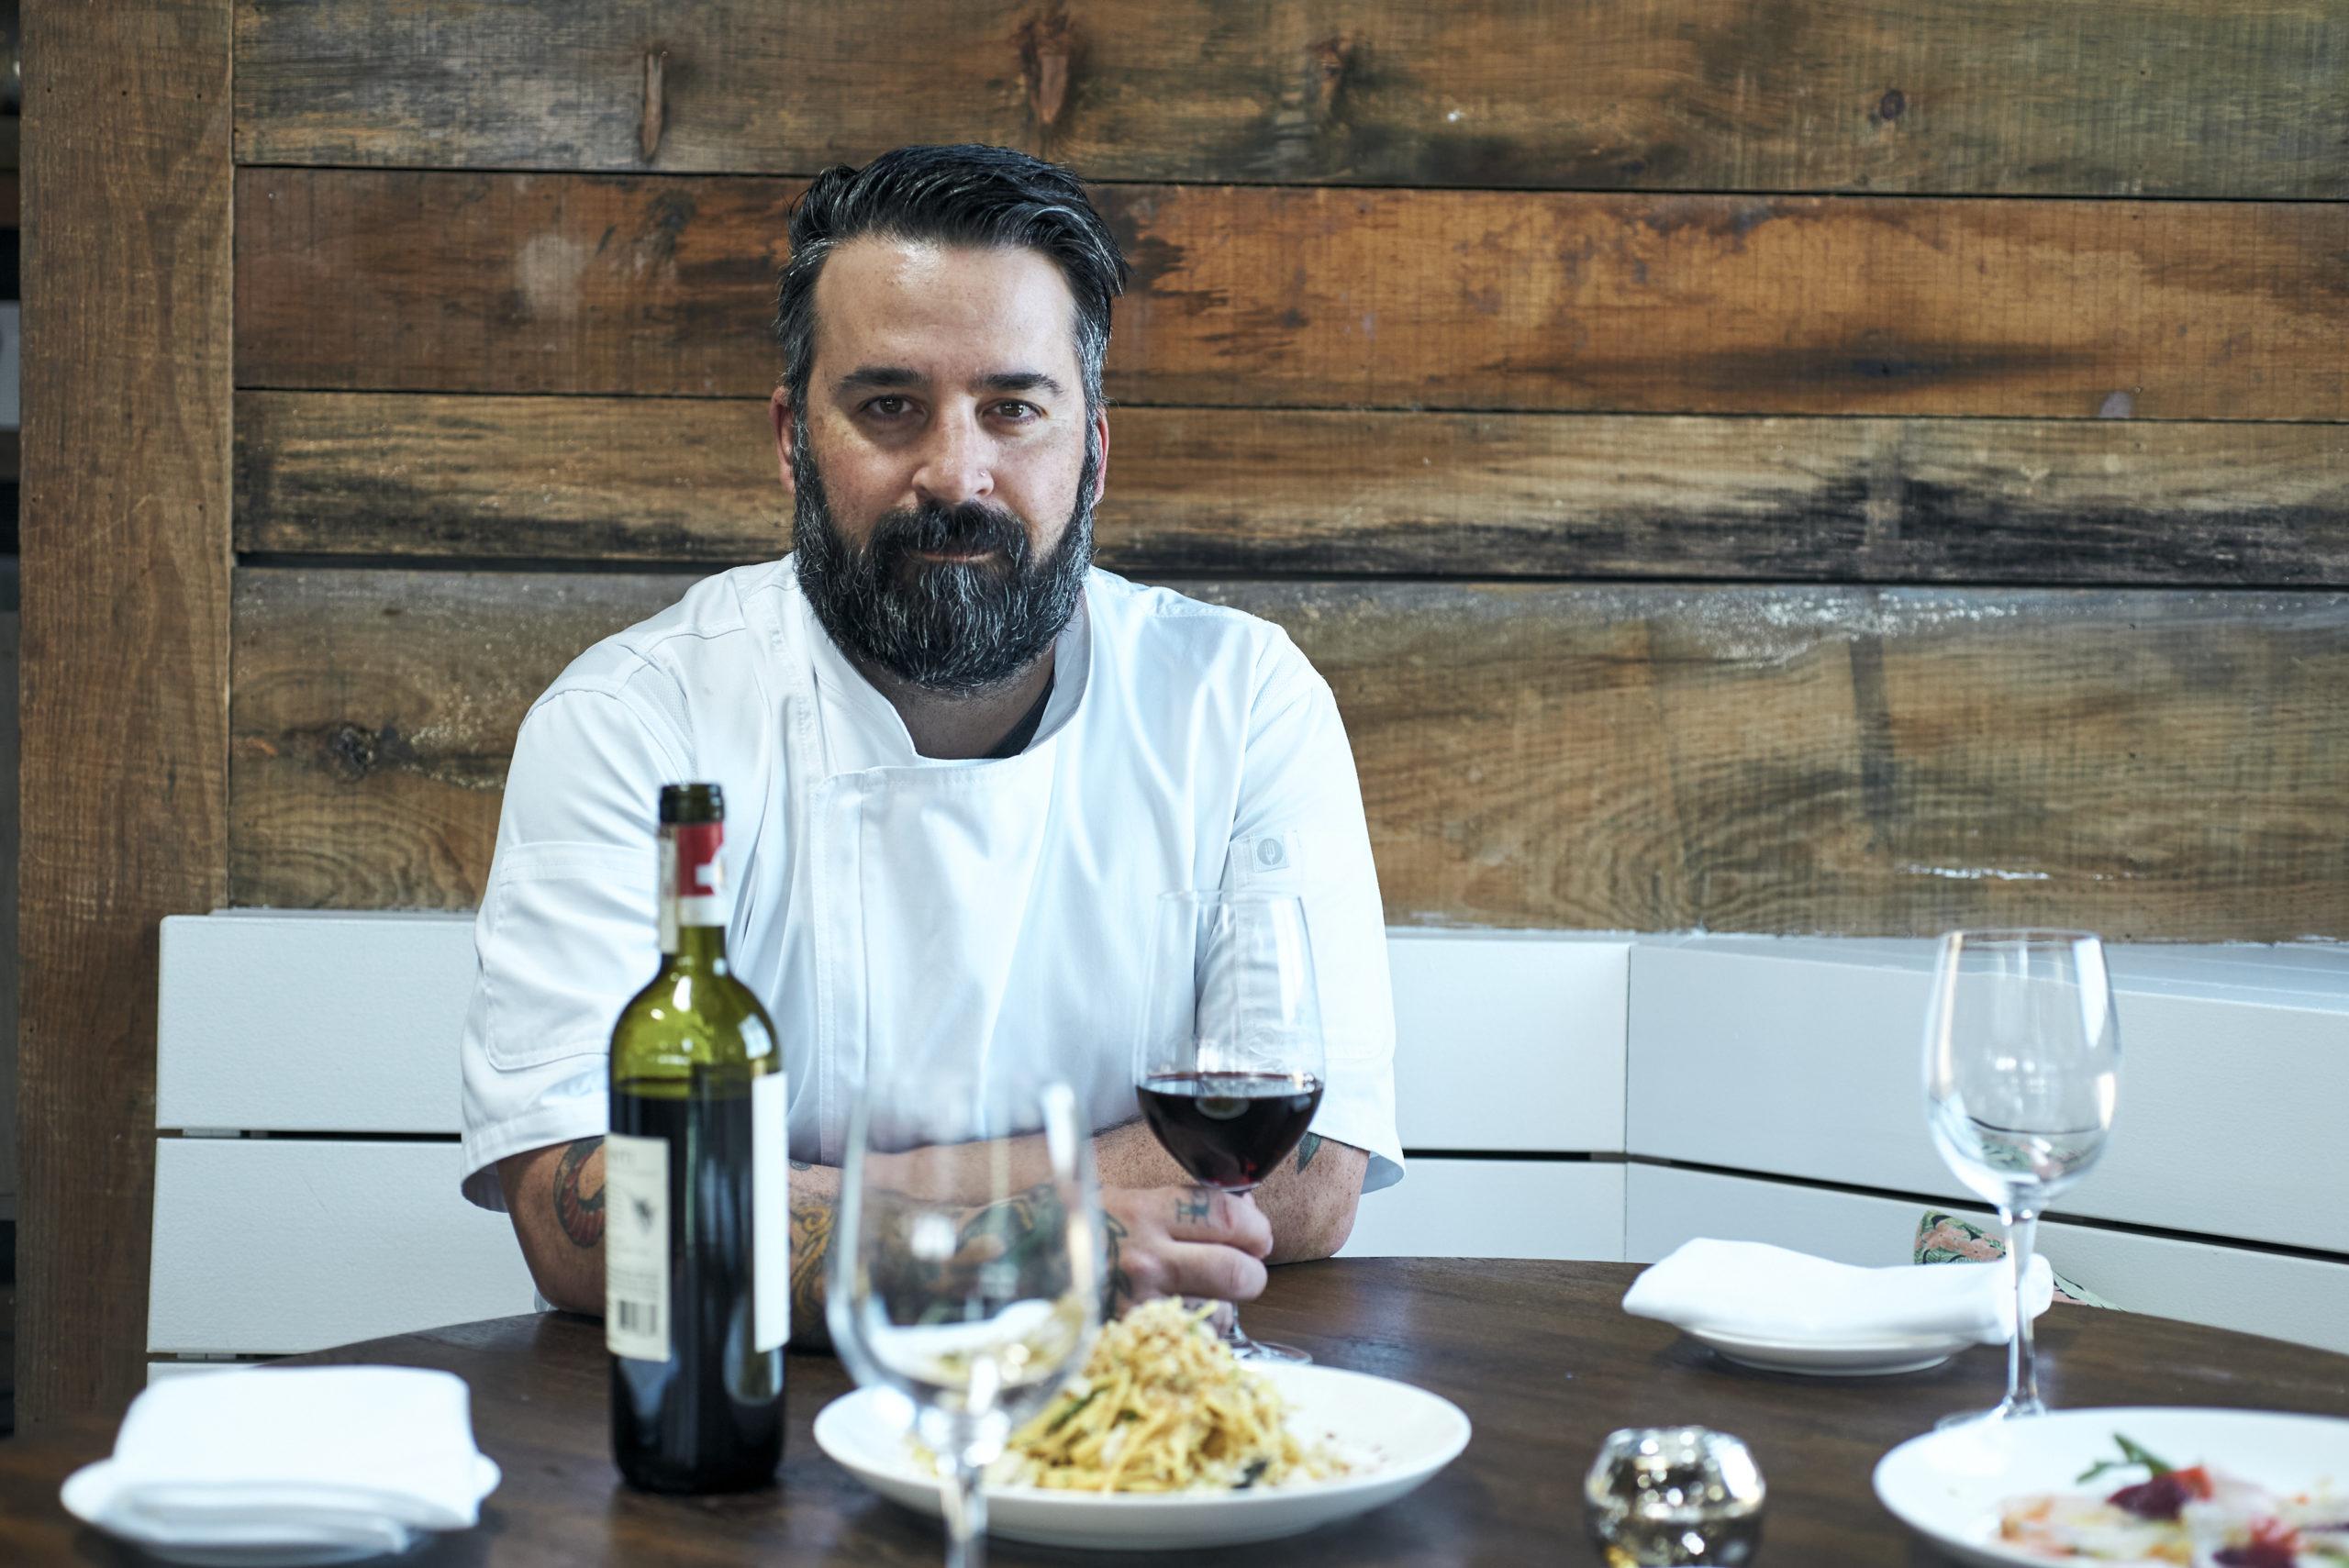 La Fin Kitchen & Lounge's executive chef James Tchinnis.